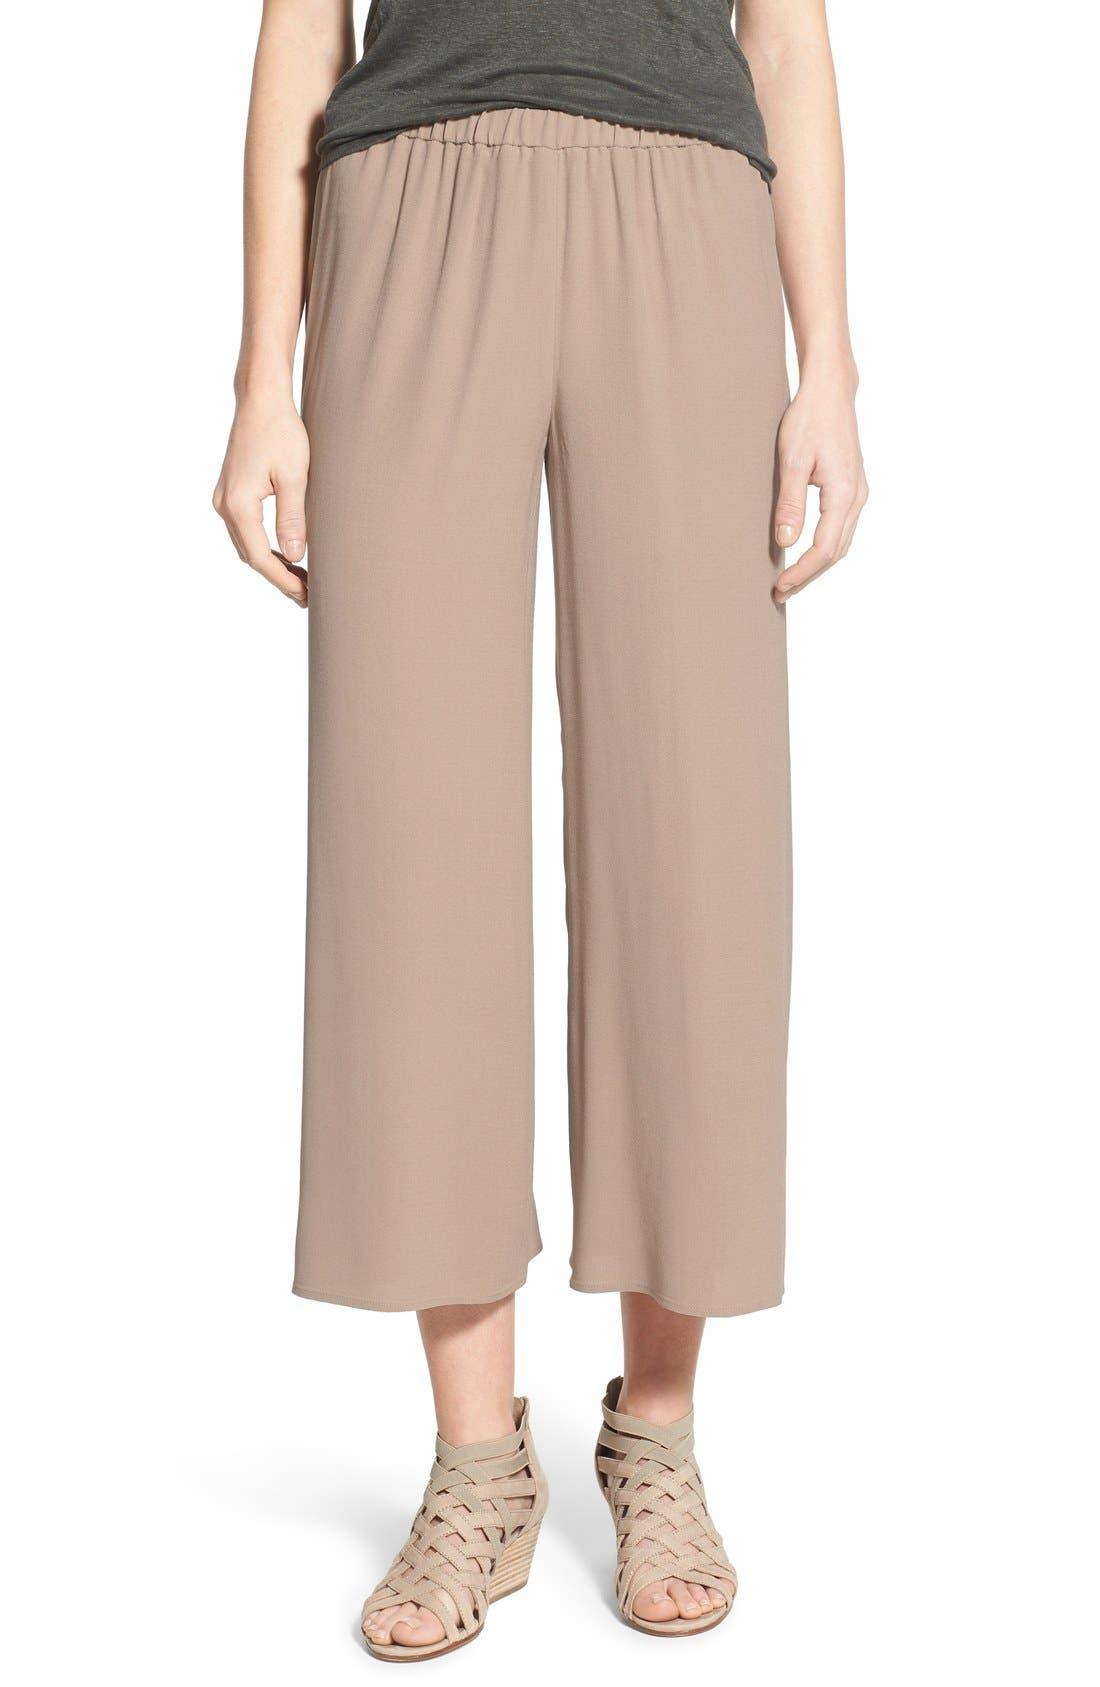 Alternate Image 1 Selected - Eileen Fisher Silk Wide Leg Crop Pants (Regular & Petite)